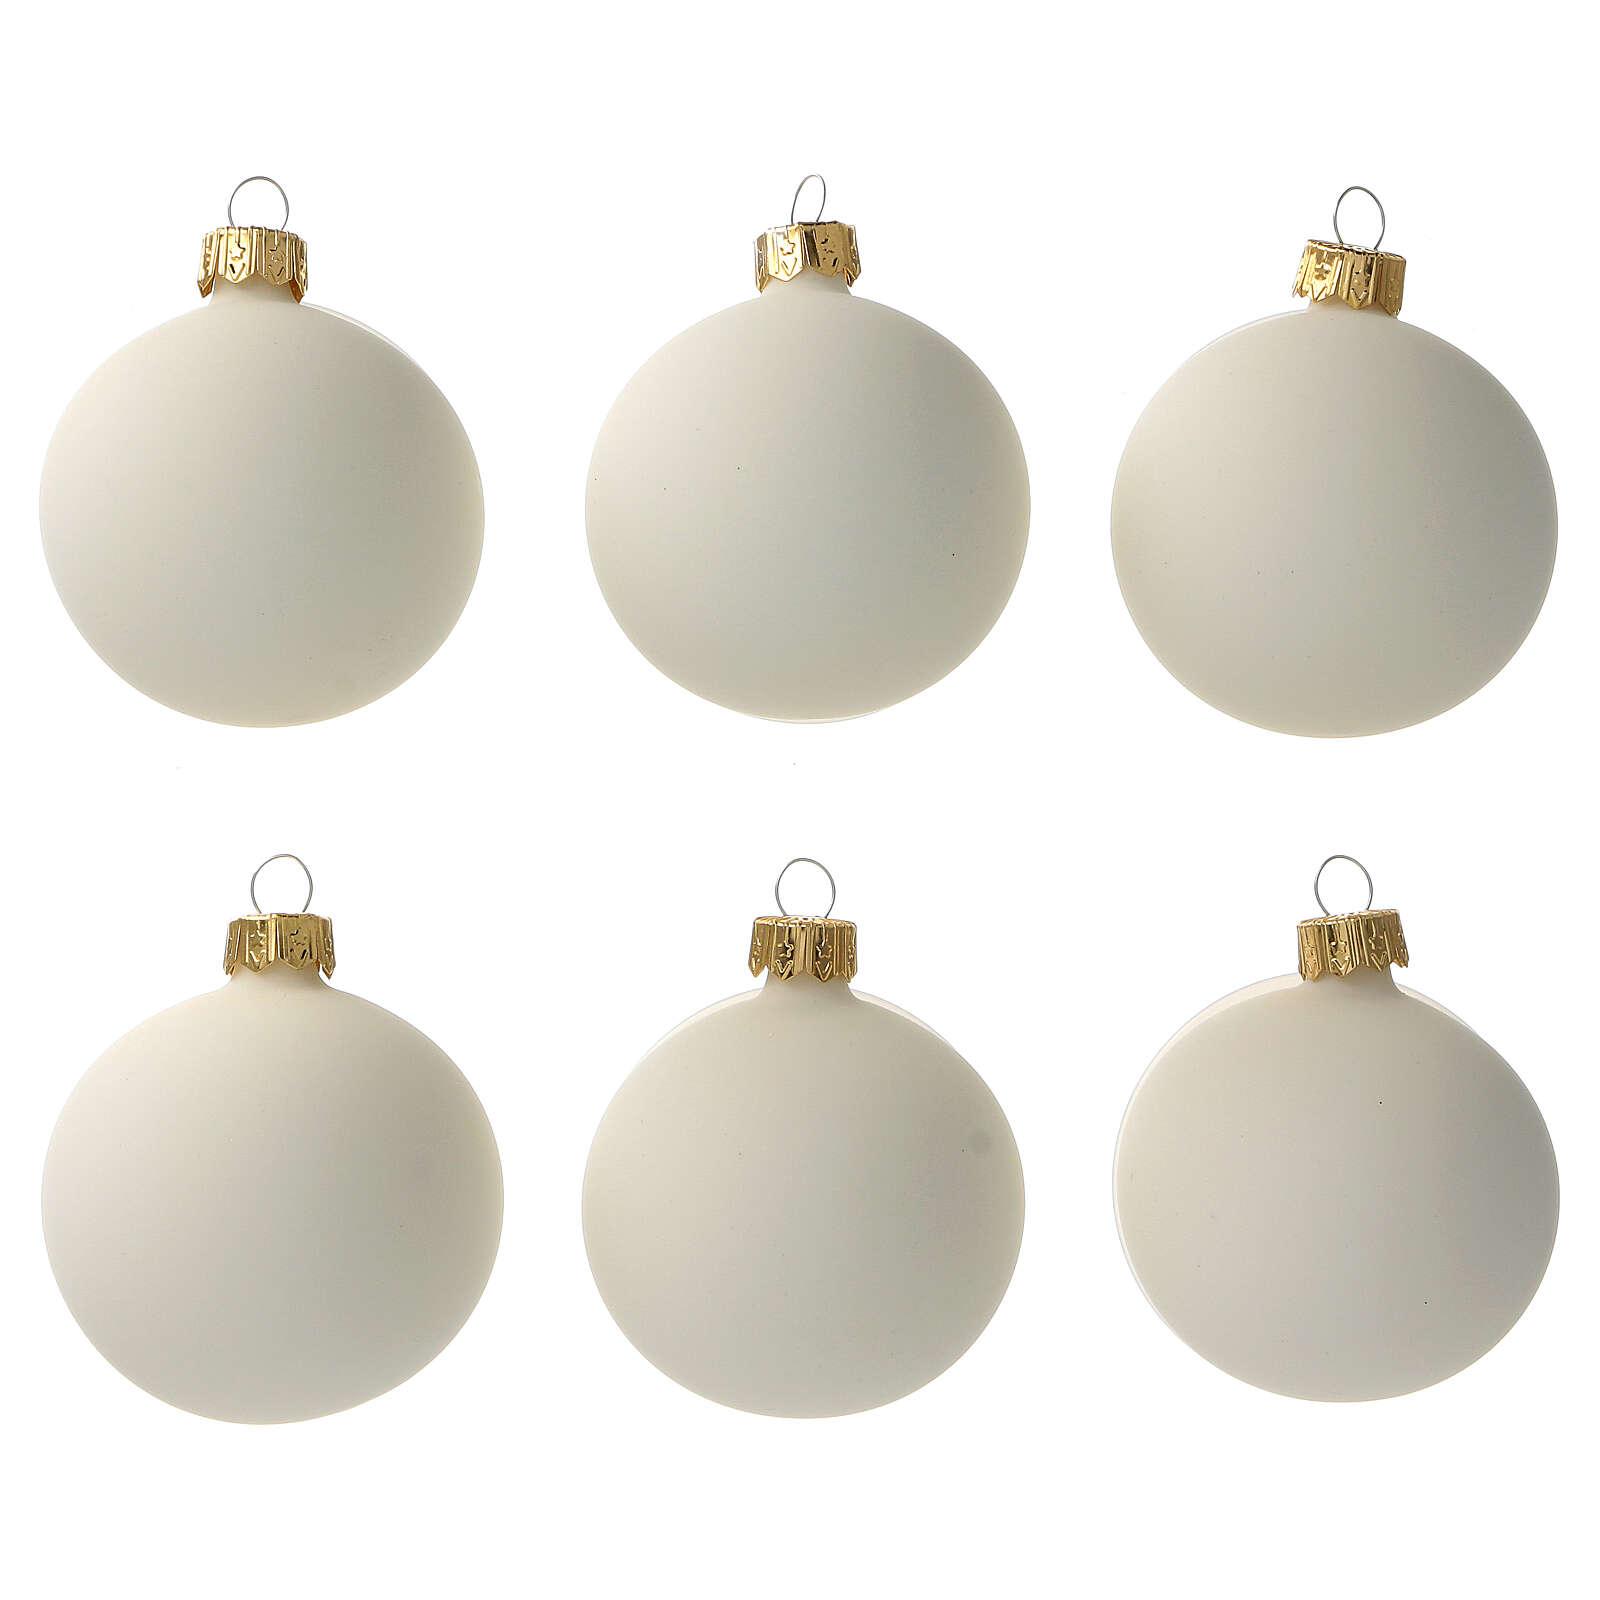 Cream-white matte Christmas balls 6 pcs set blown glass 4